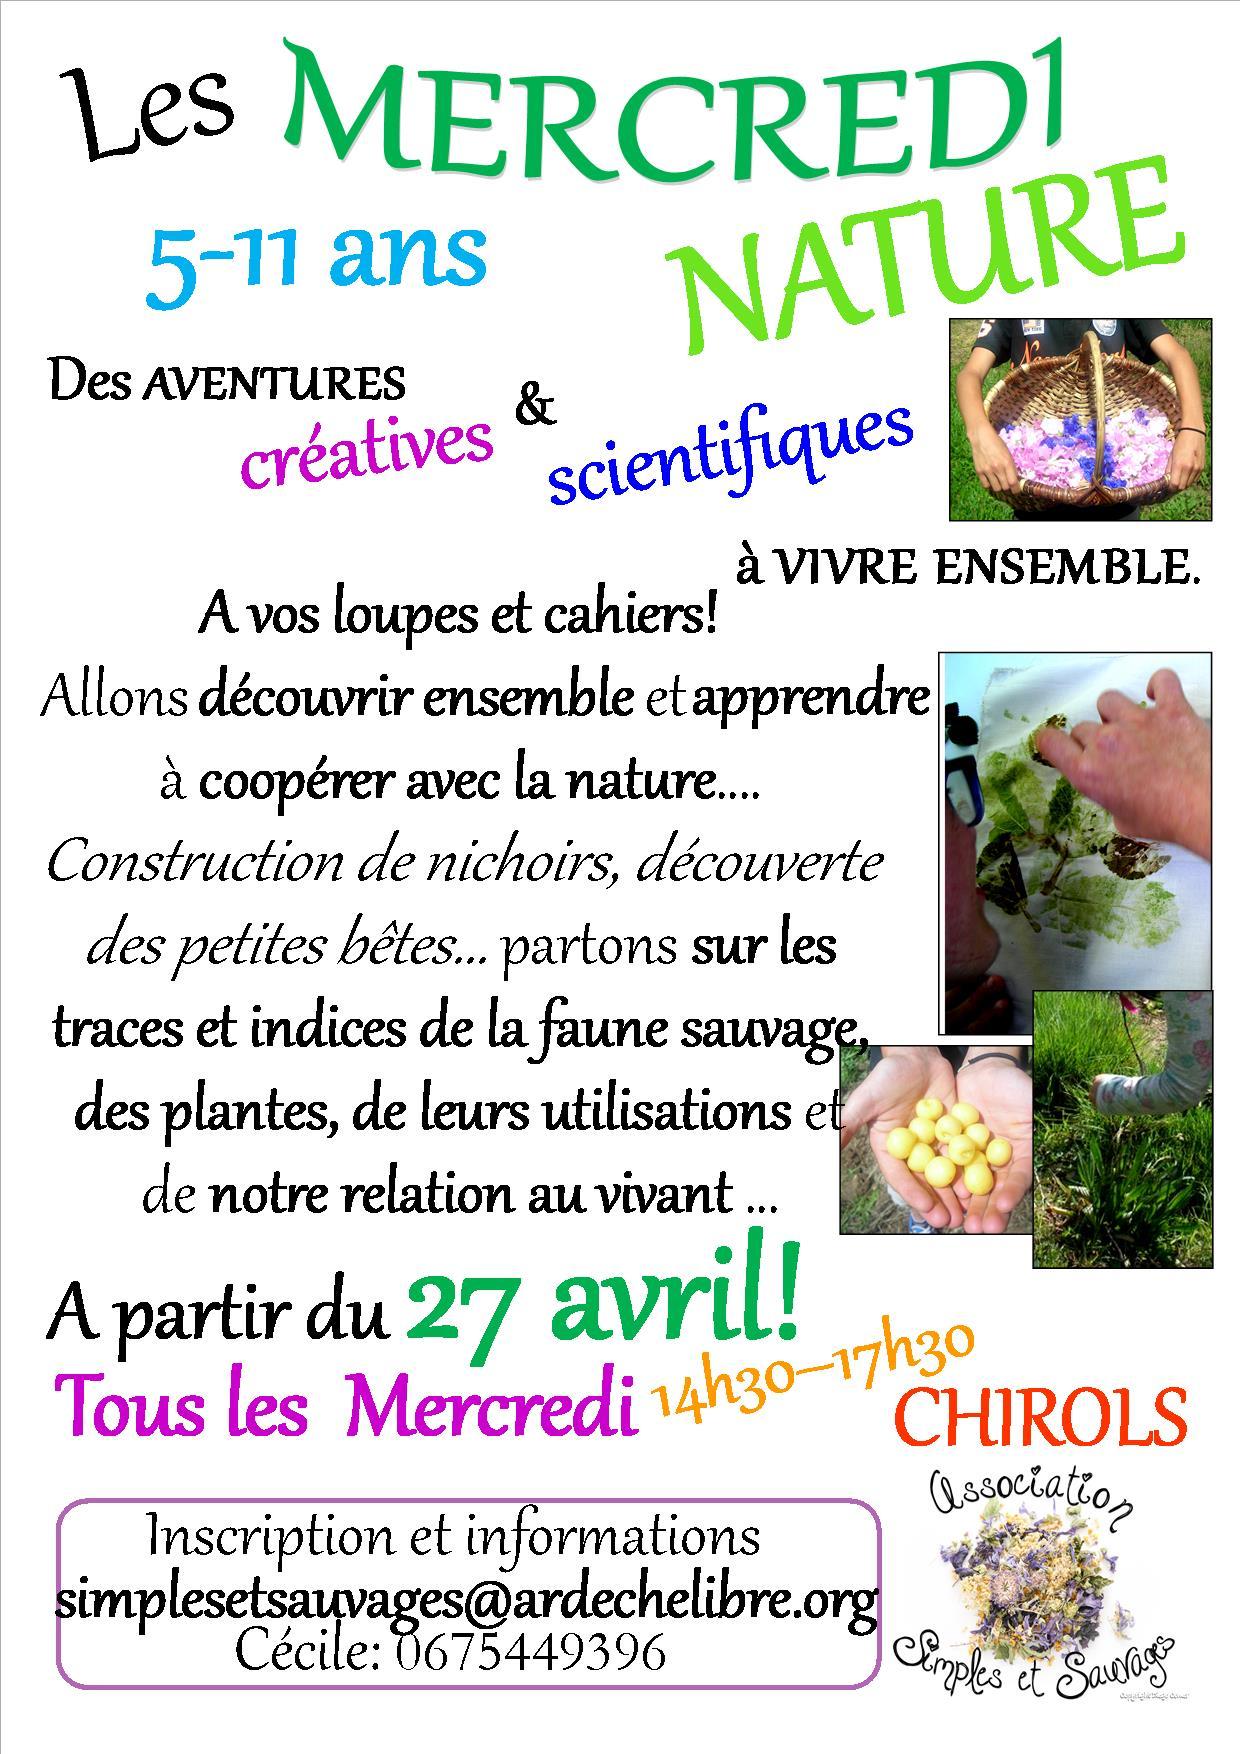 Mercredi nature